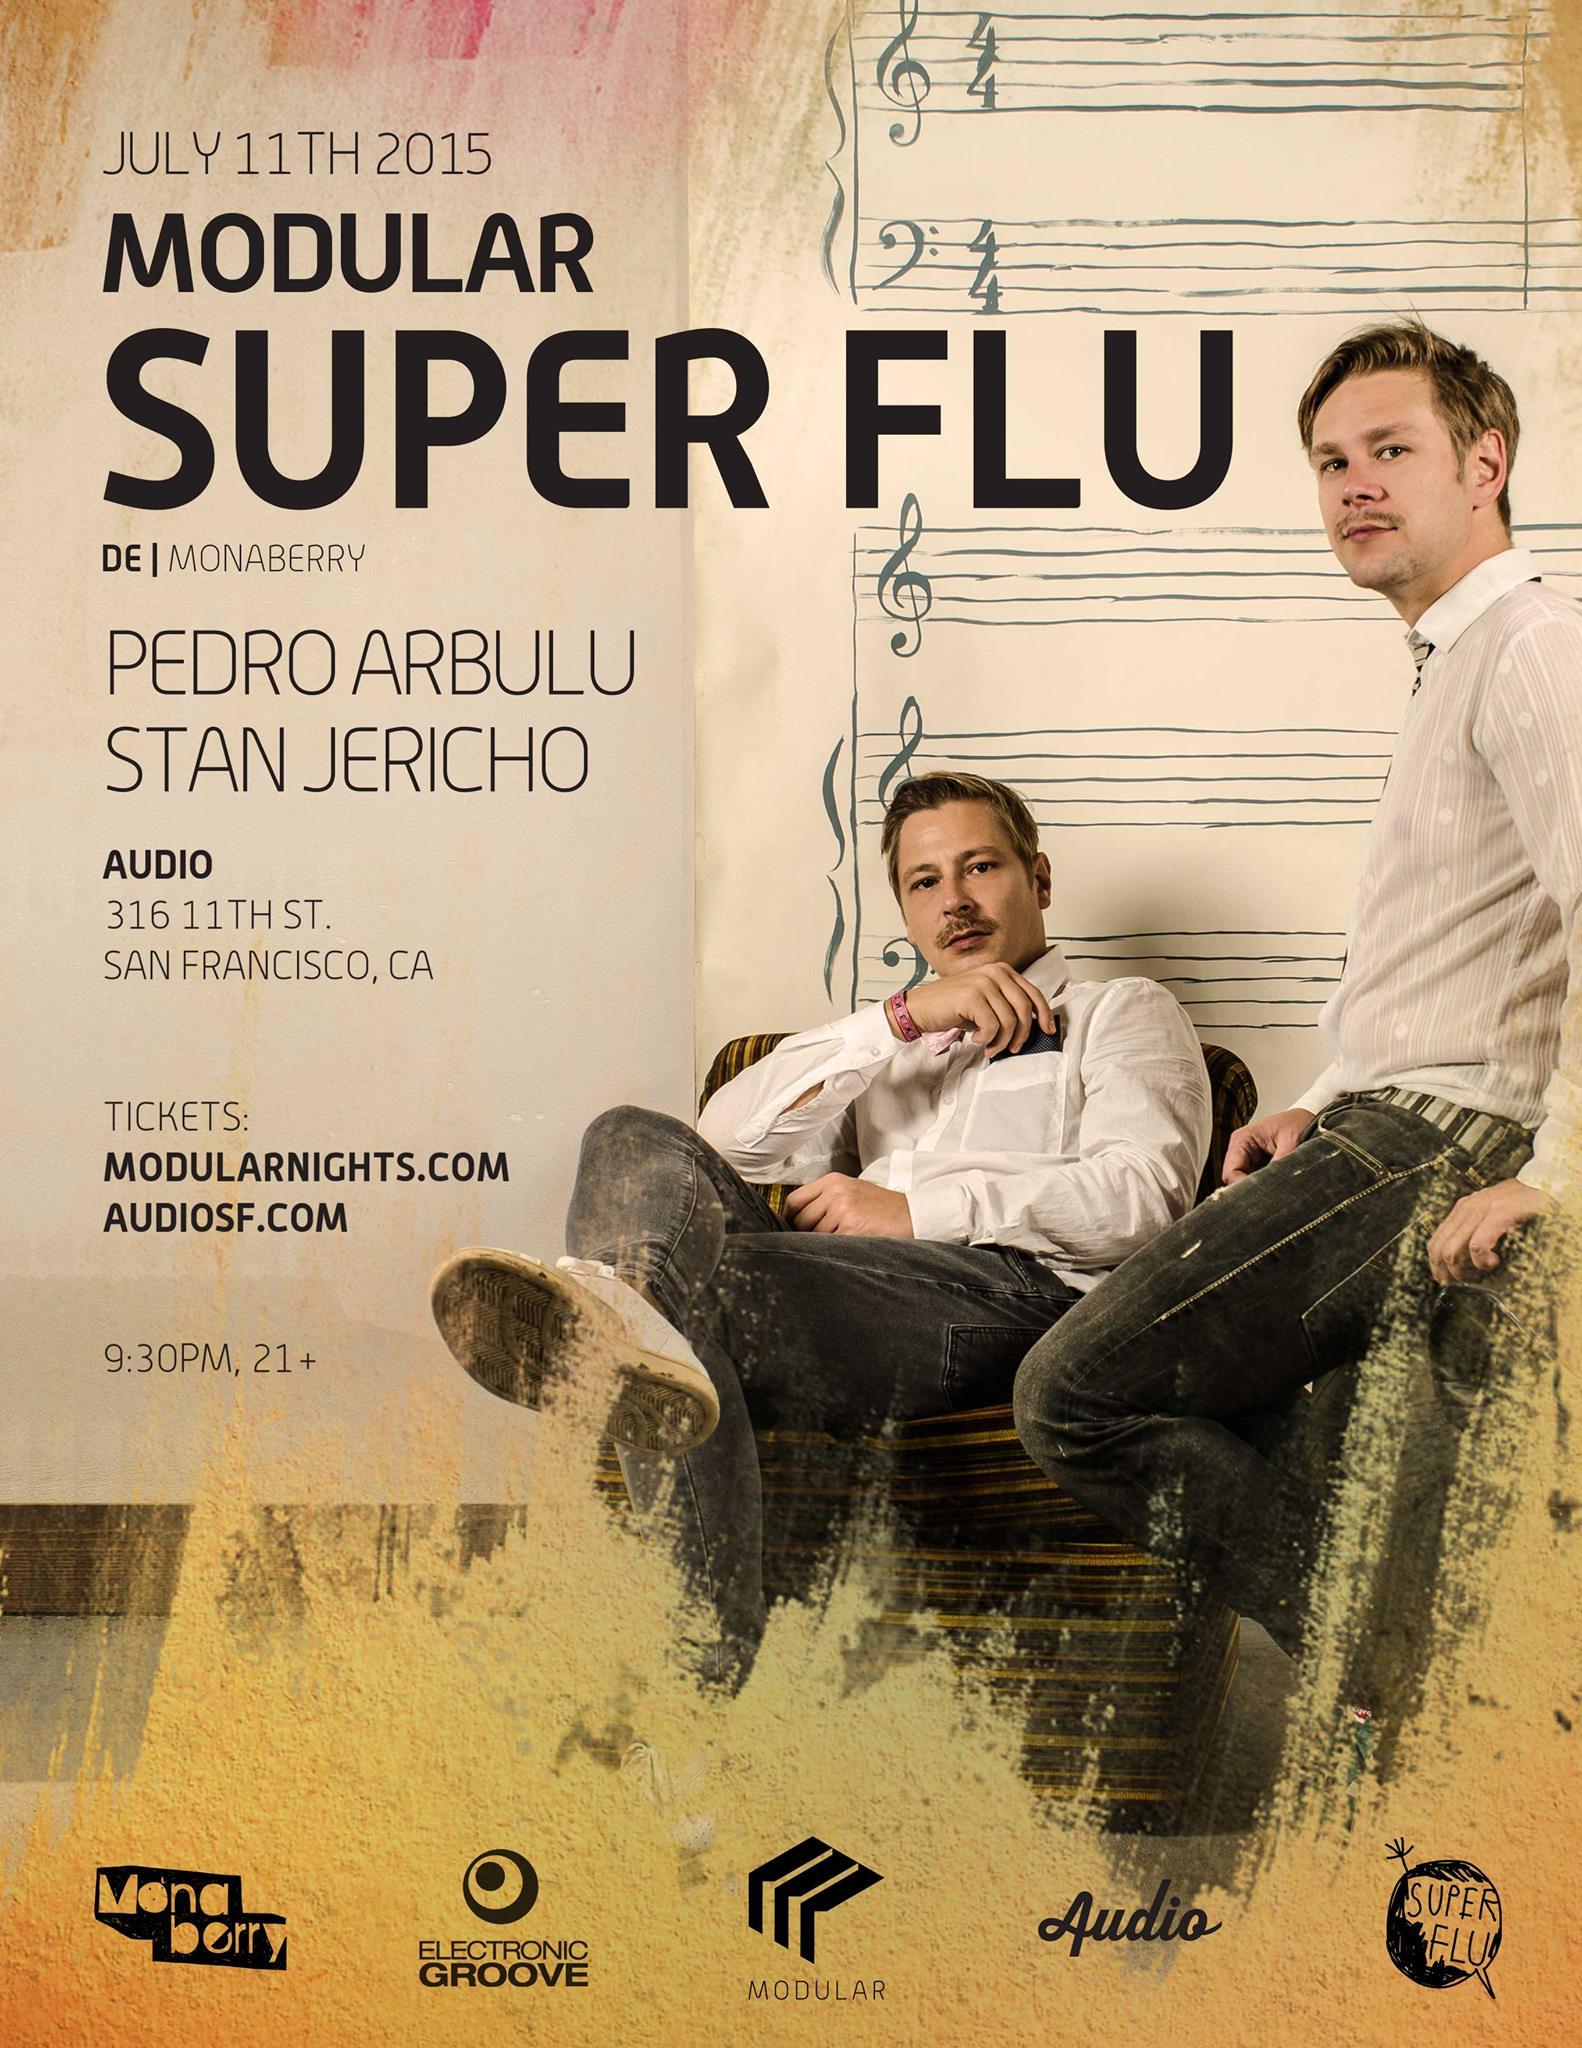 Super Flu Modular San Francisco